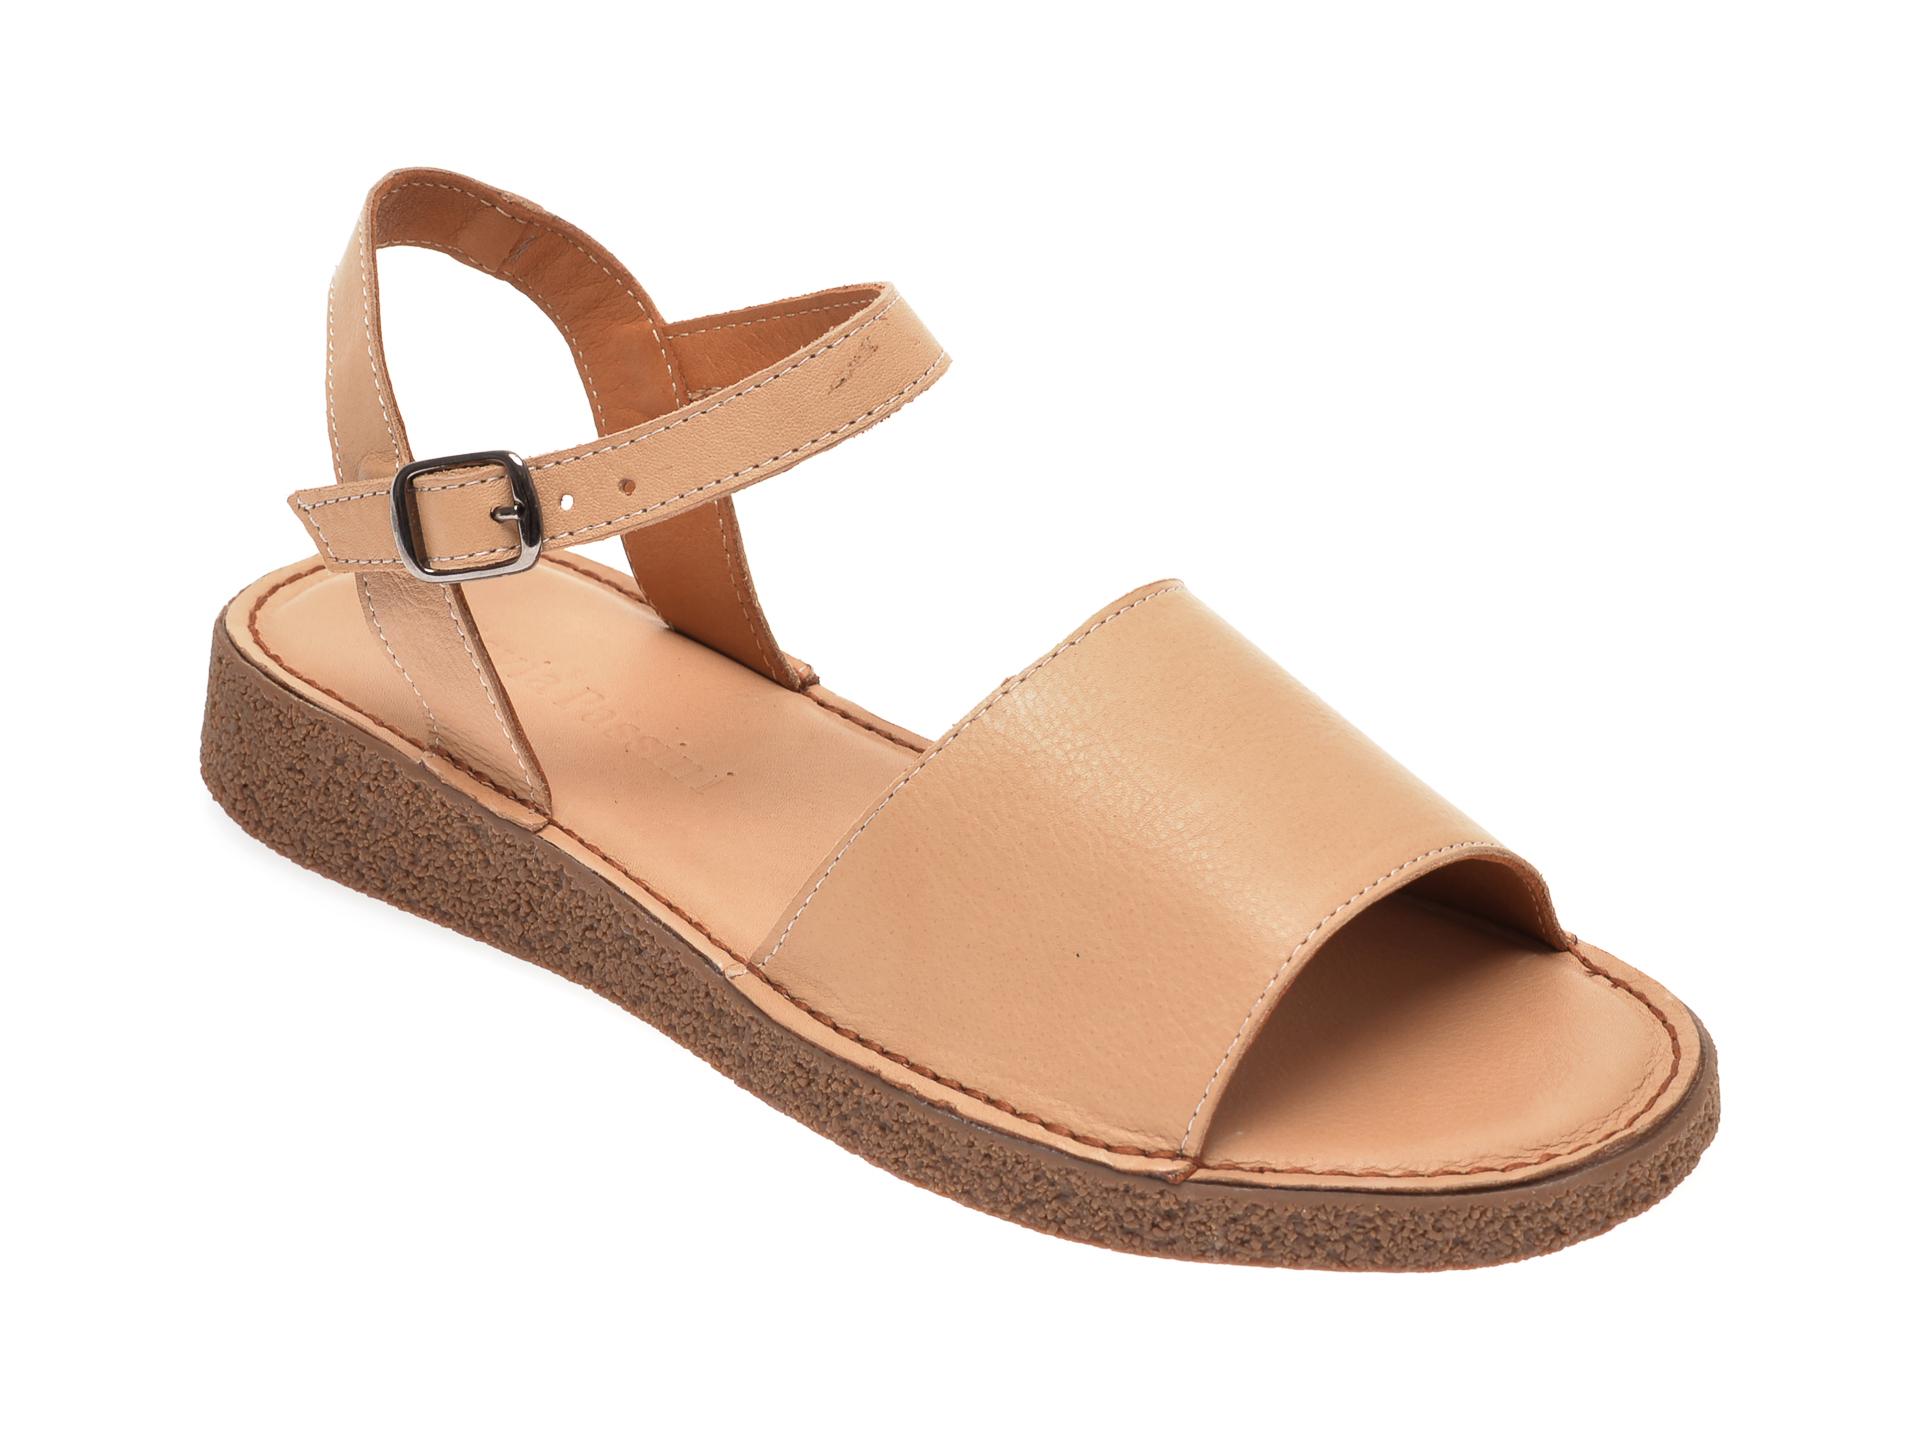 Sandale FLAVIA PASSINI bej, 0761461, din piele naturala imagine